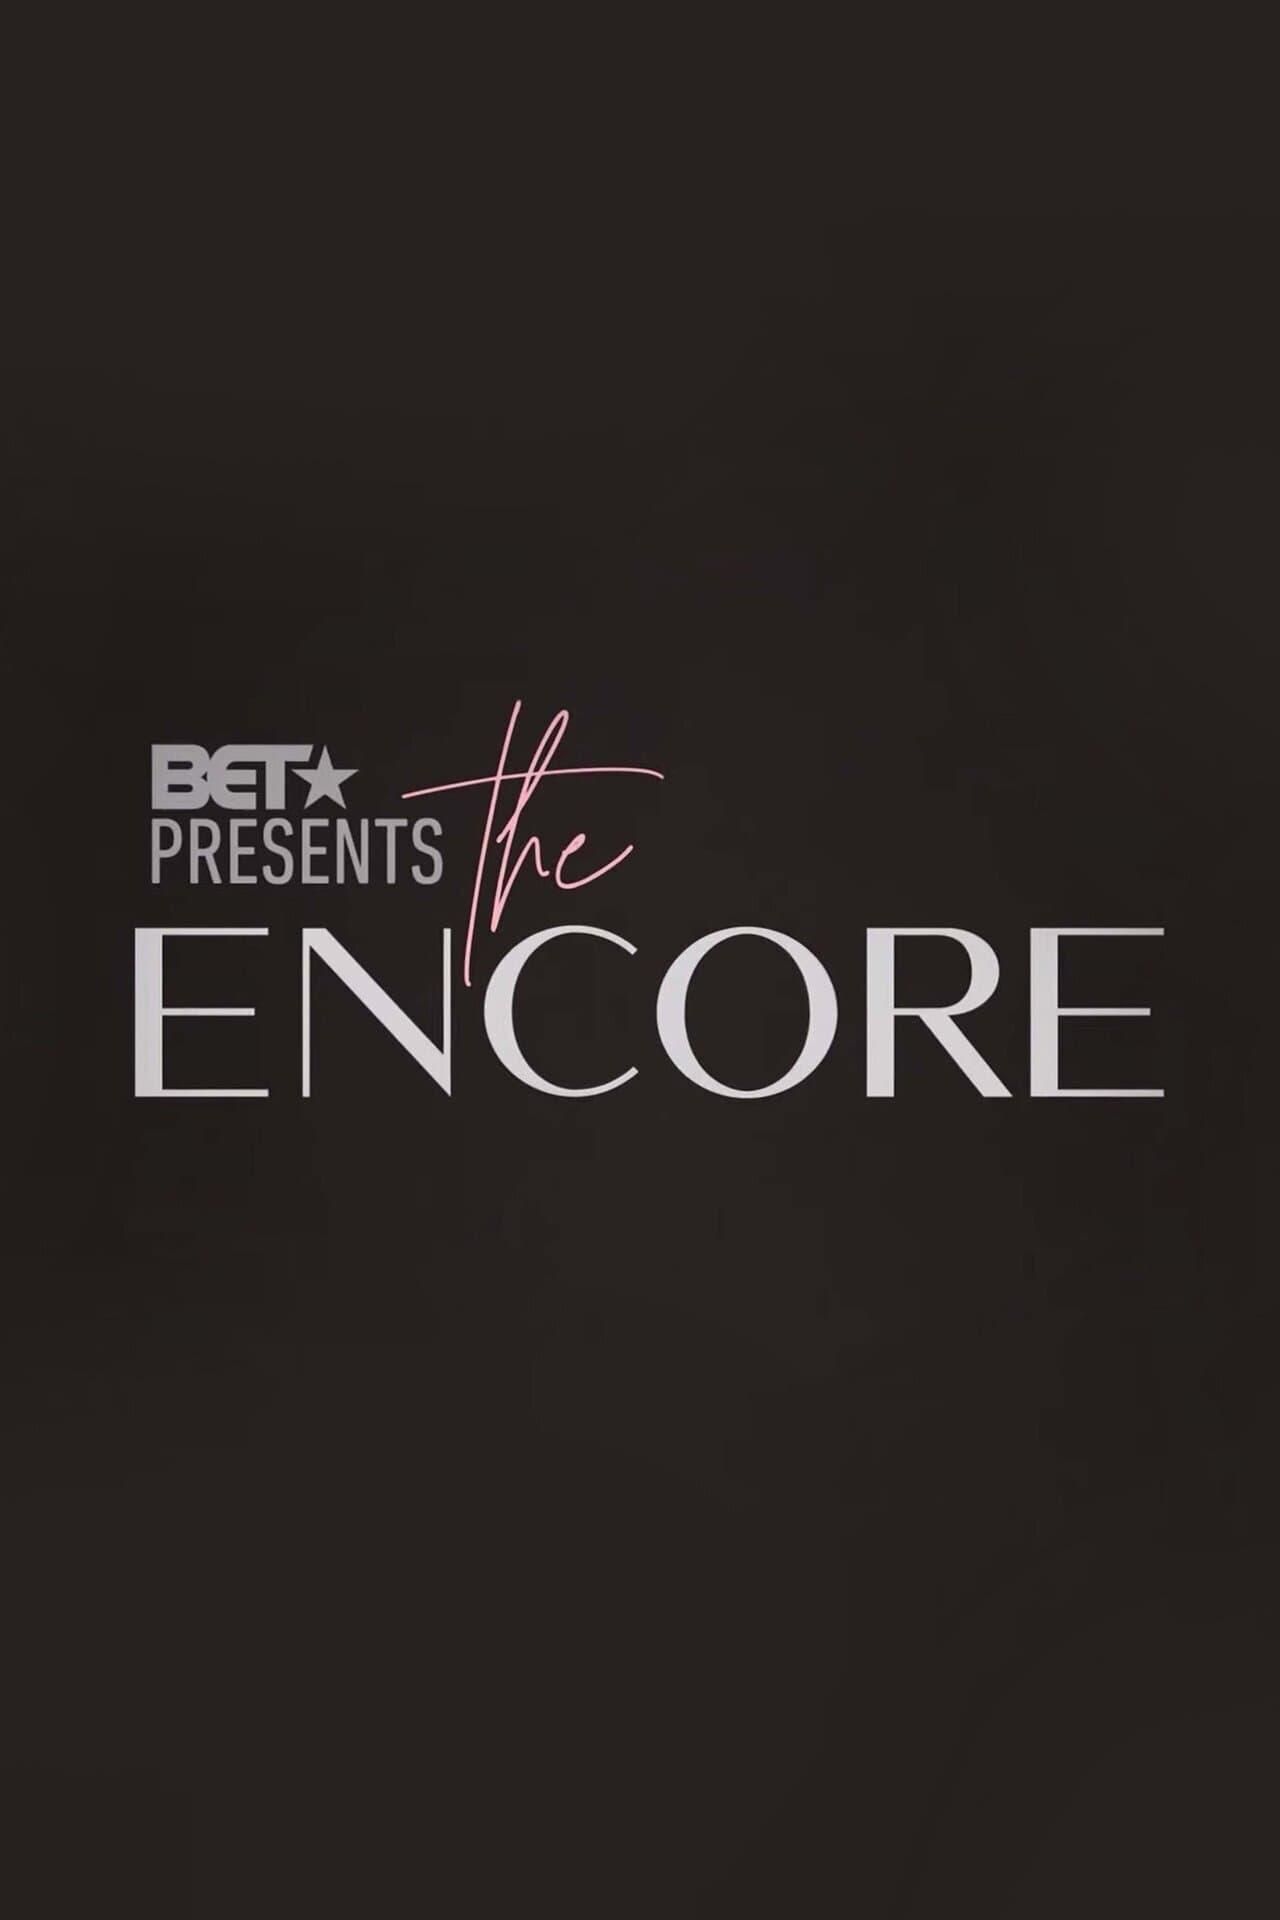 BET Presents: The Encore